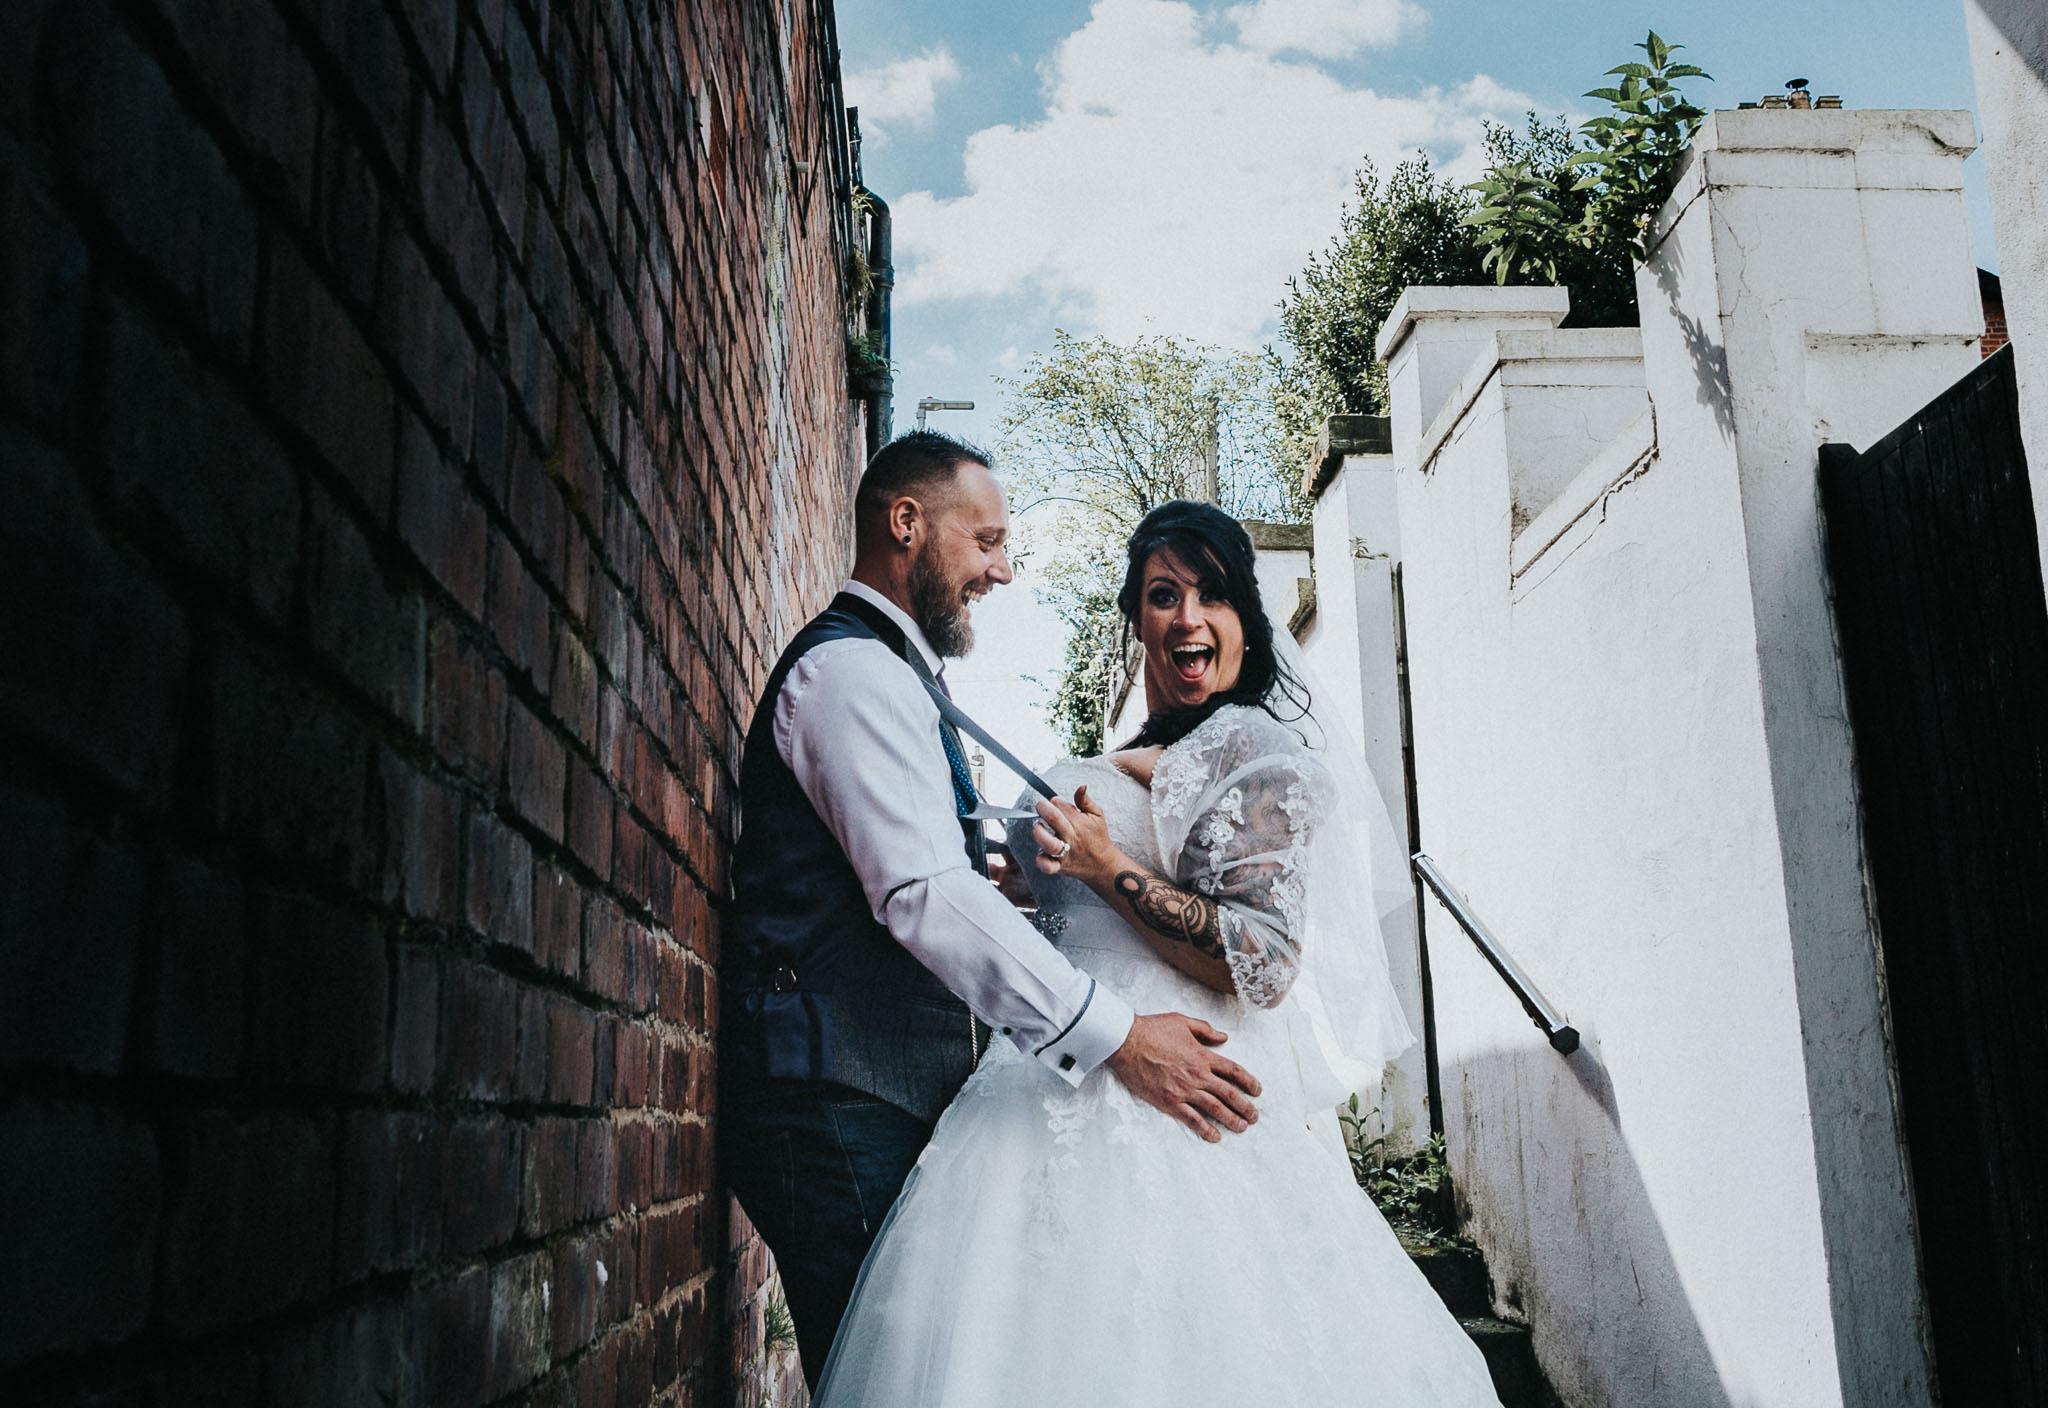 fun-wedding-photography-at-the-belle-epoque-knutsford-wedding-photographer (9).jpg